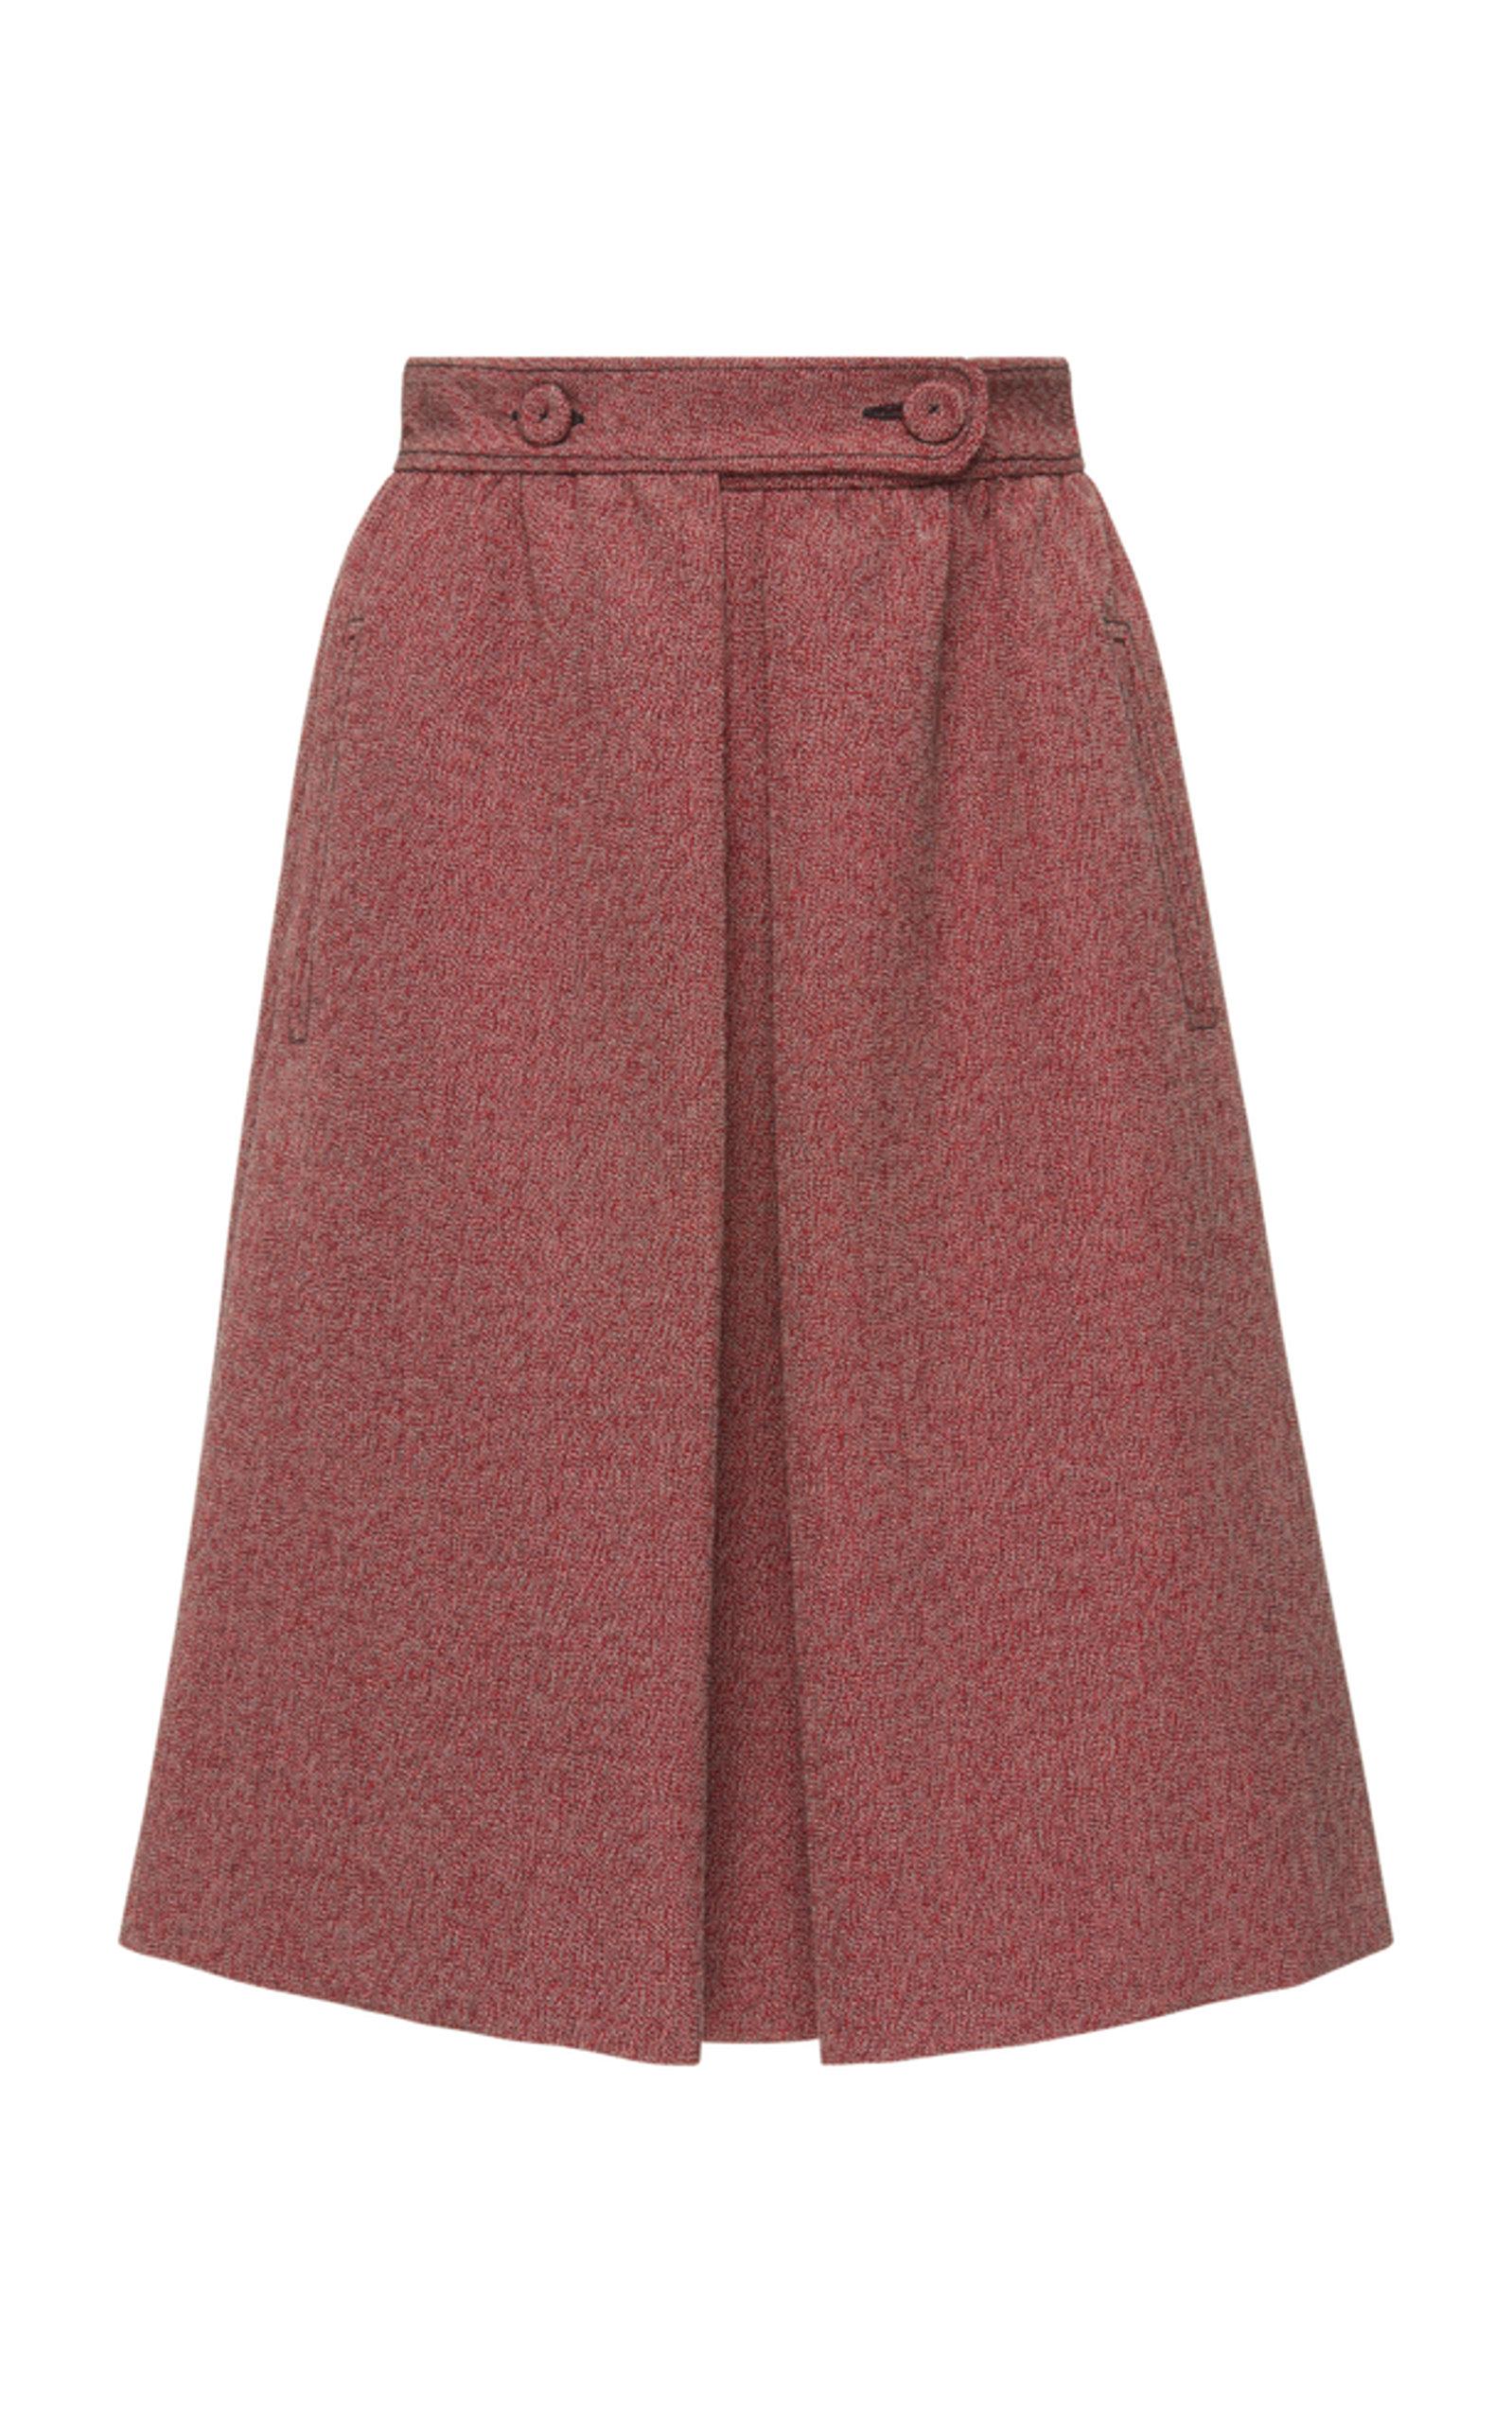 Bottega Veneta Skirts A-line skirt